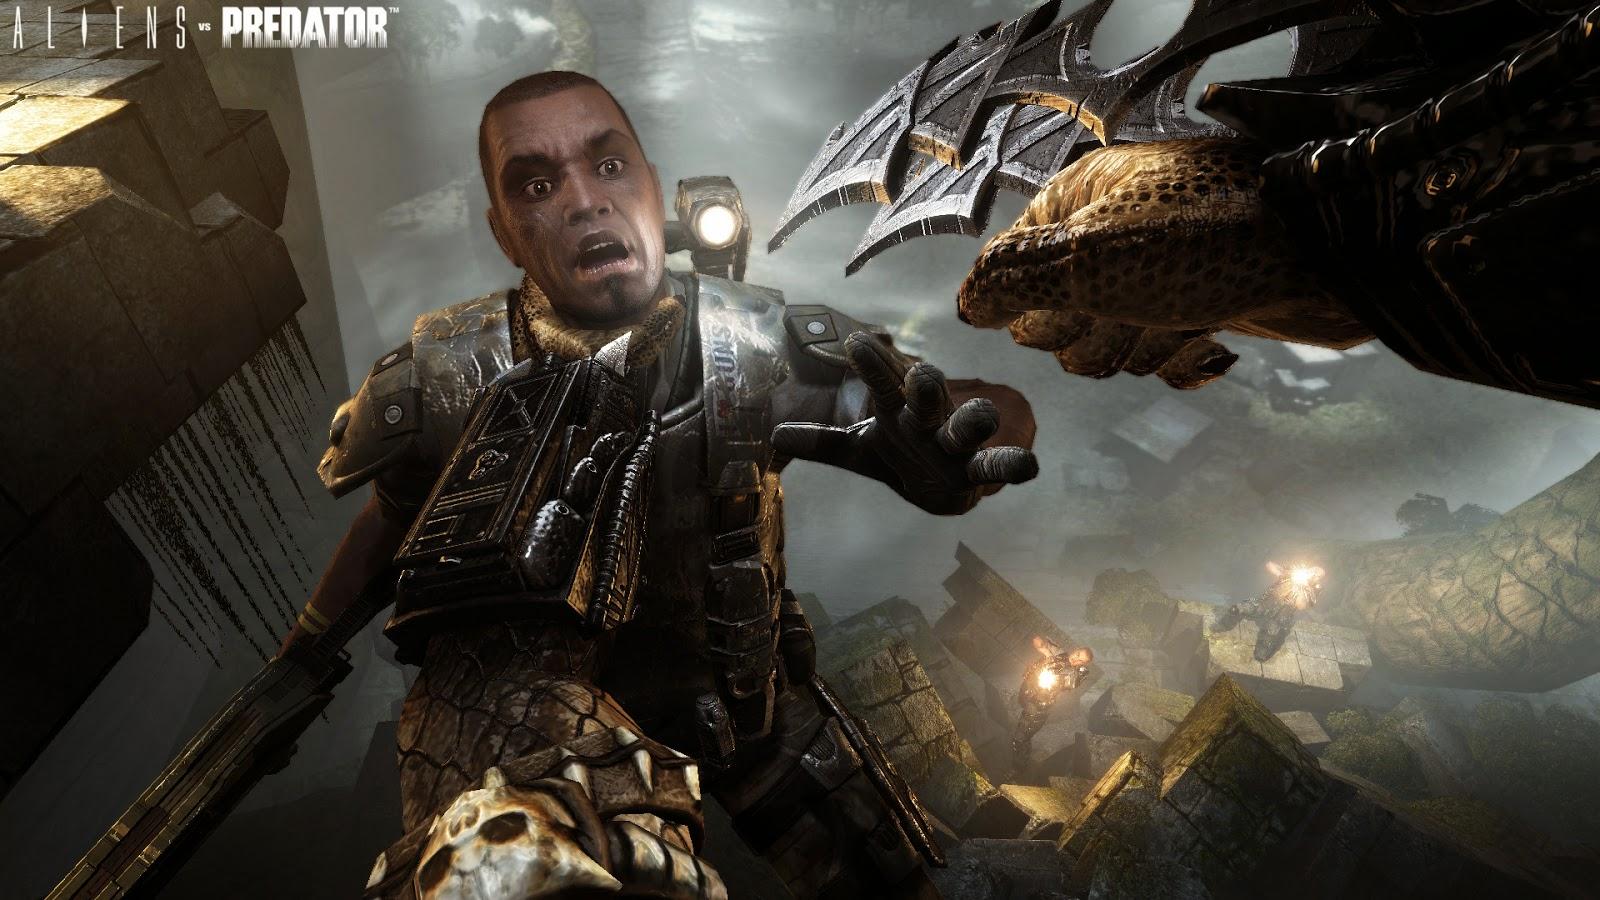 Aliens vs Predator 2010 Free Game Download - Free PC Games Den